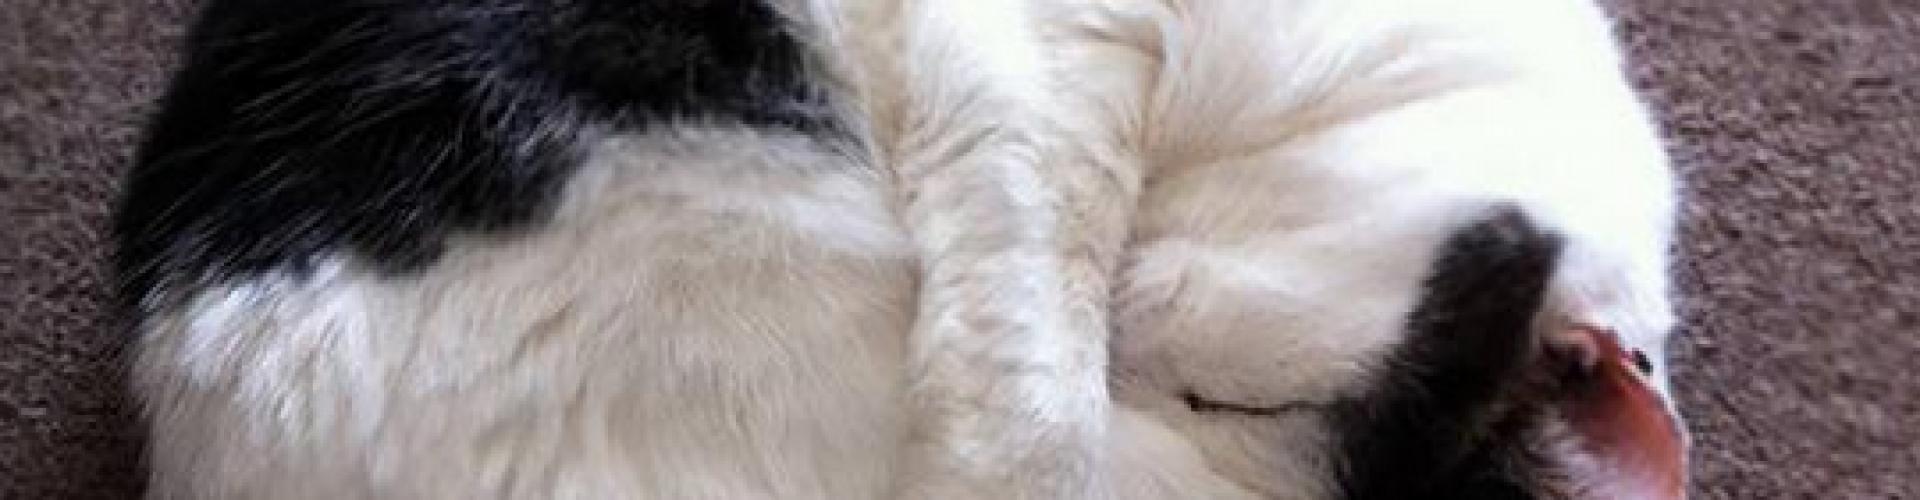 catstretch